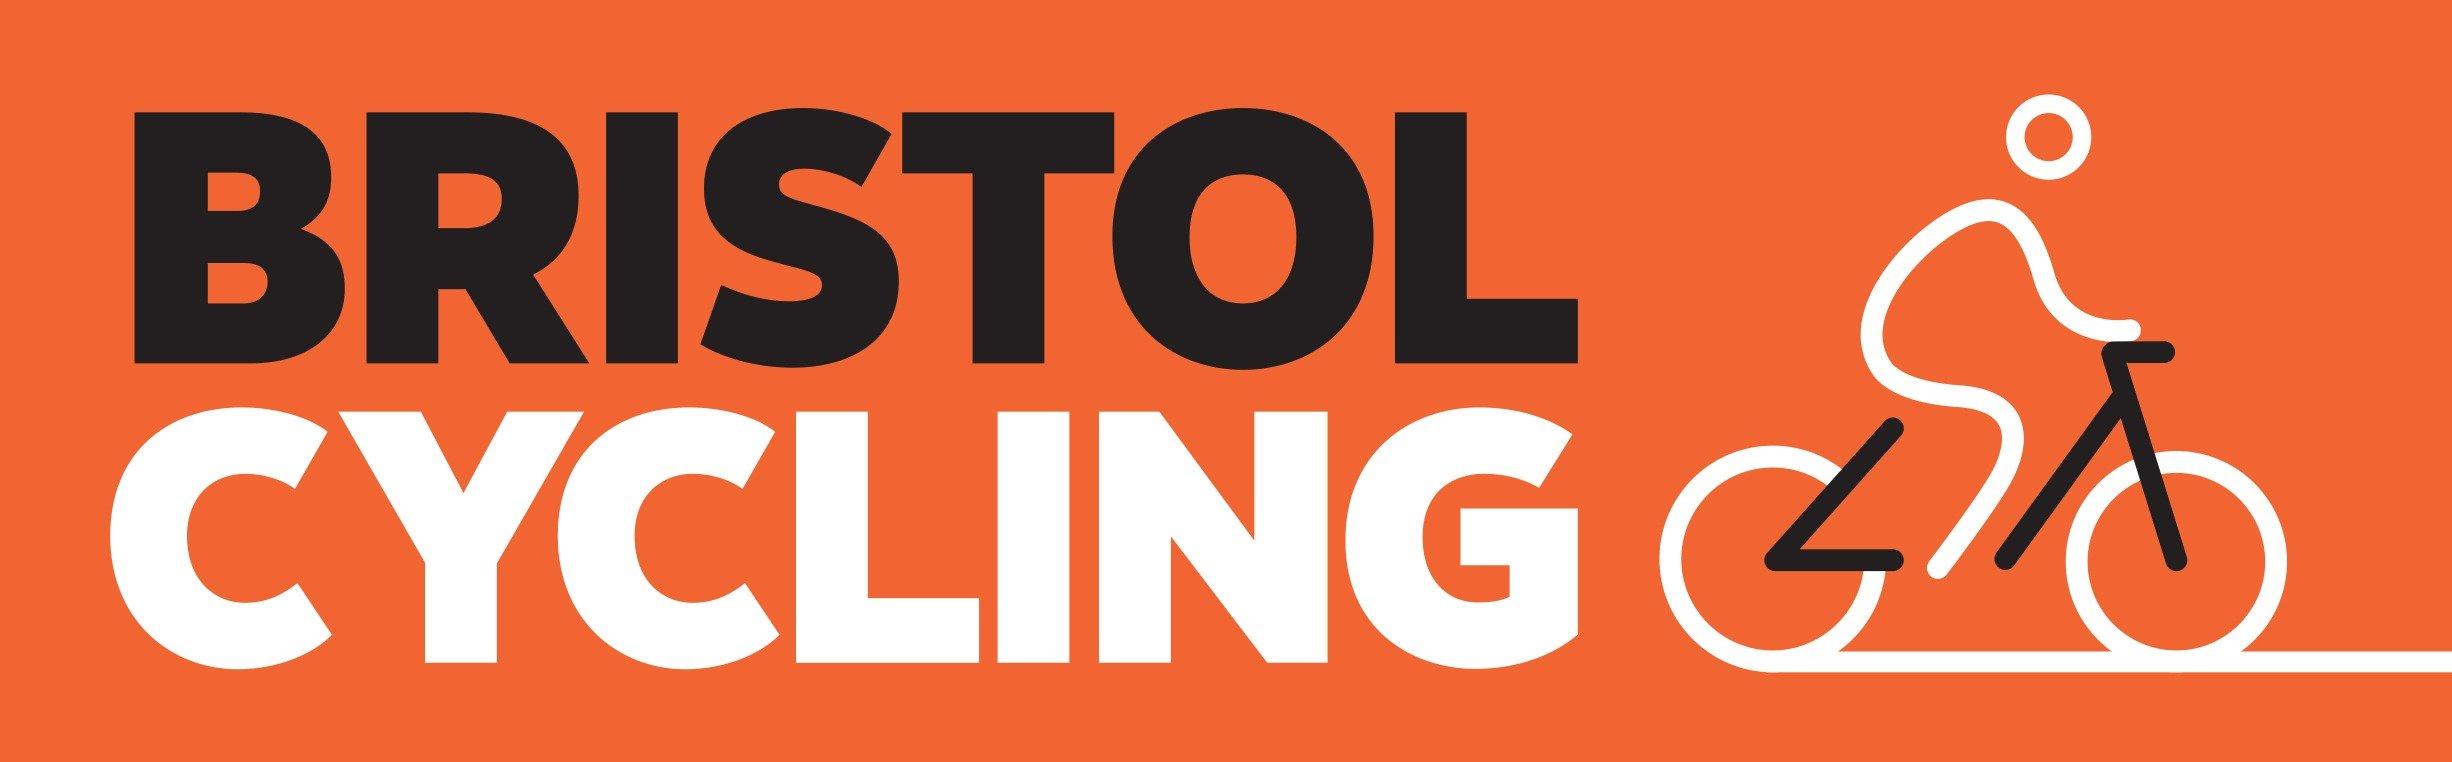 Bristol Cycling Campaign